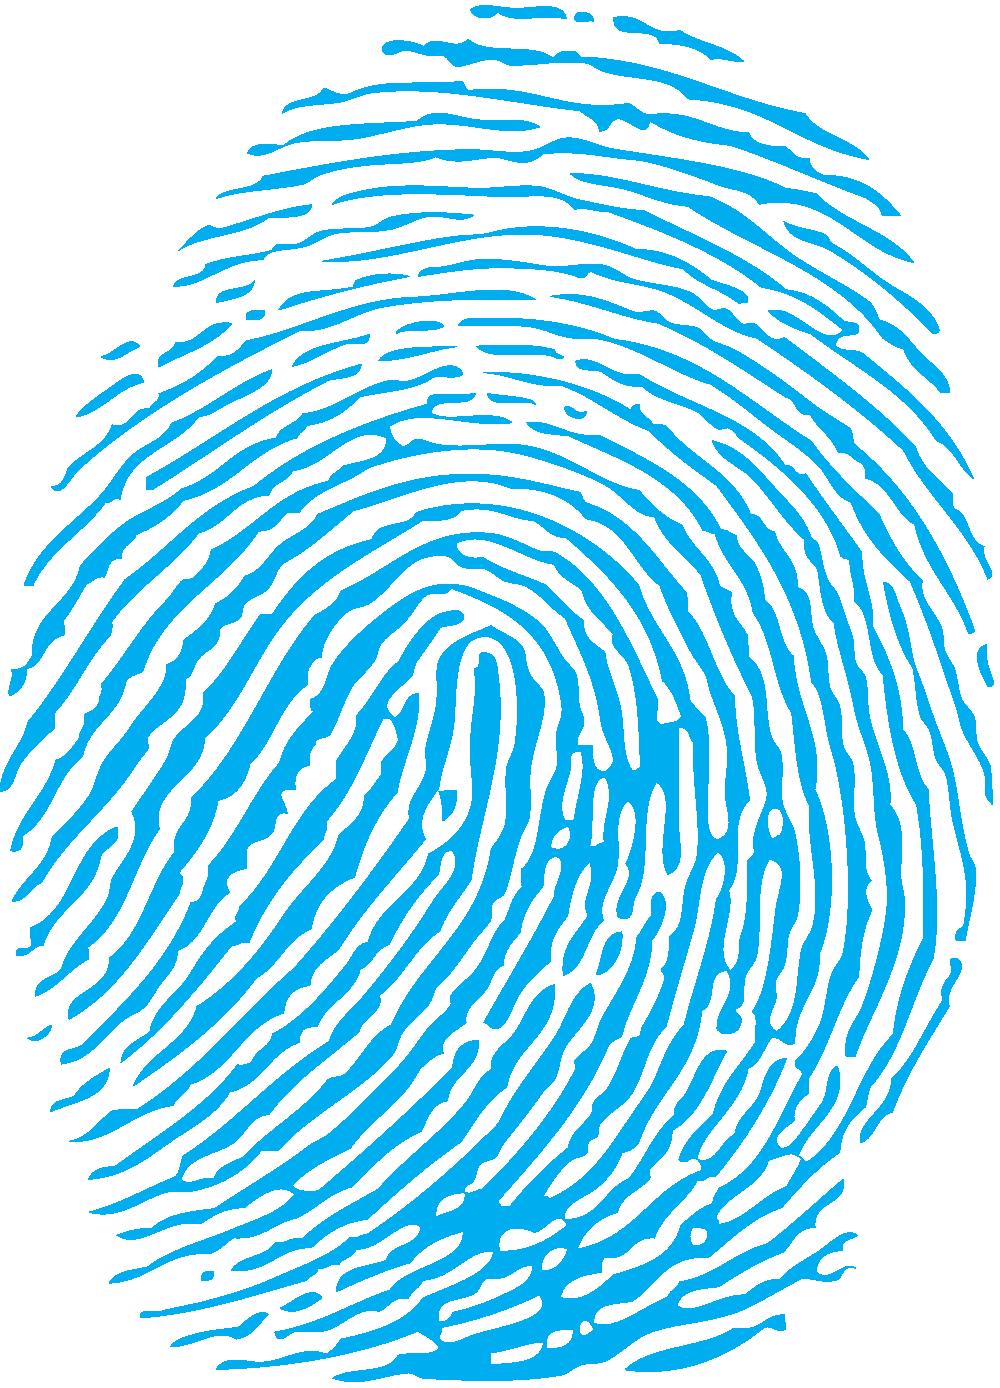 Fingerprint clipart finger scanner. Png google search yearbook